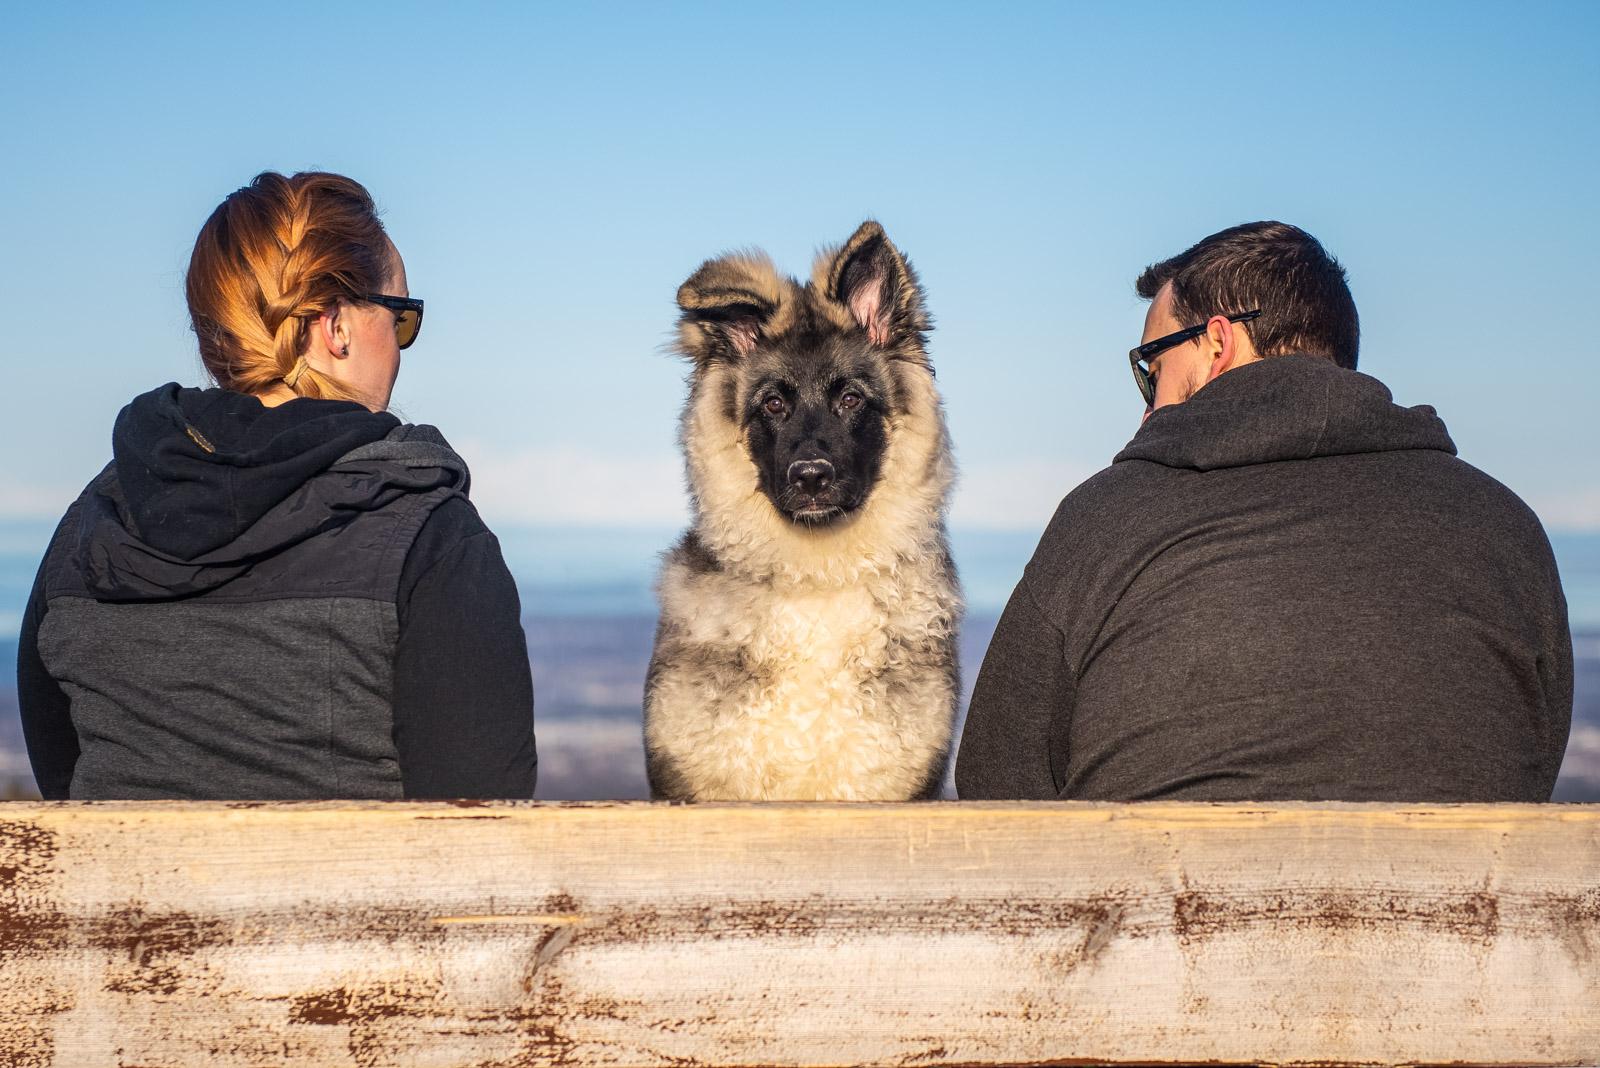 Meredith Berg Photography Anchorage Alaska Dog Pet Photographer Bear German Shepherd Mix_DSC5670-Edit-Edit.jpg